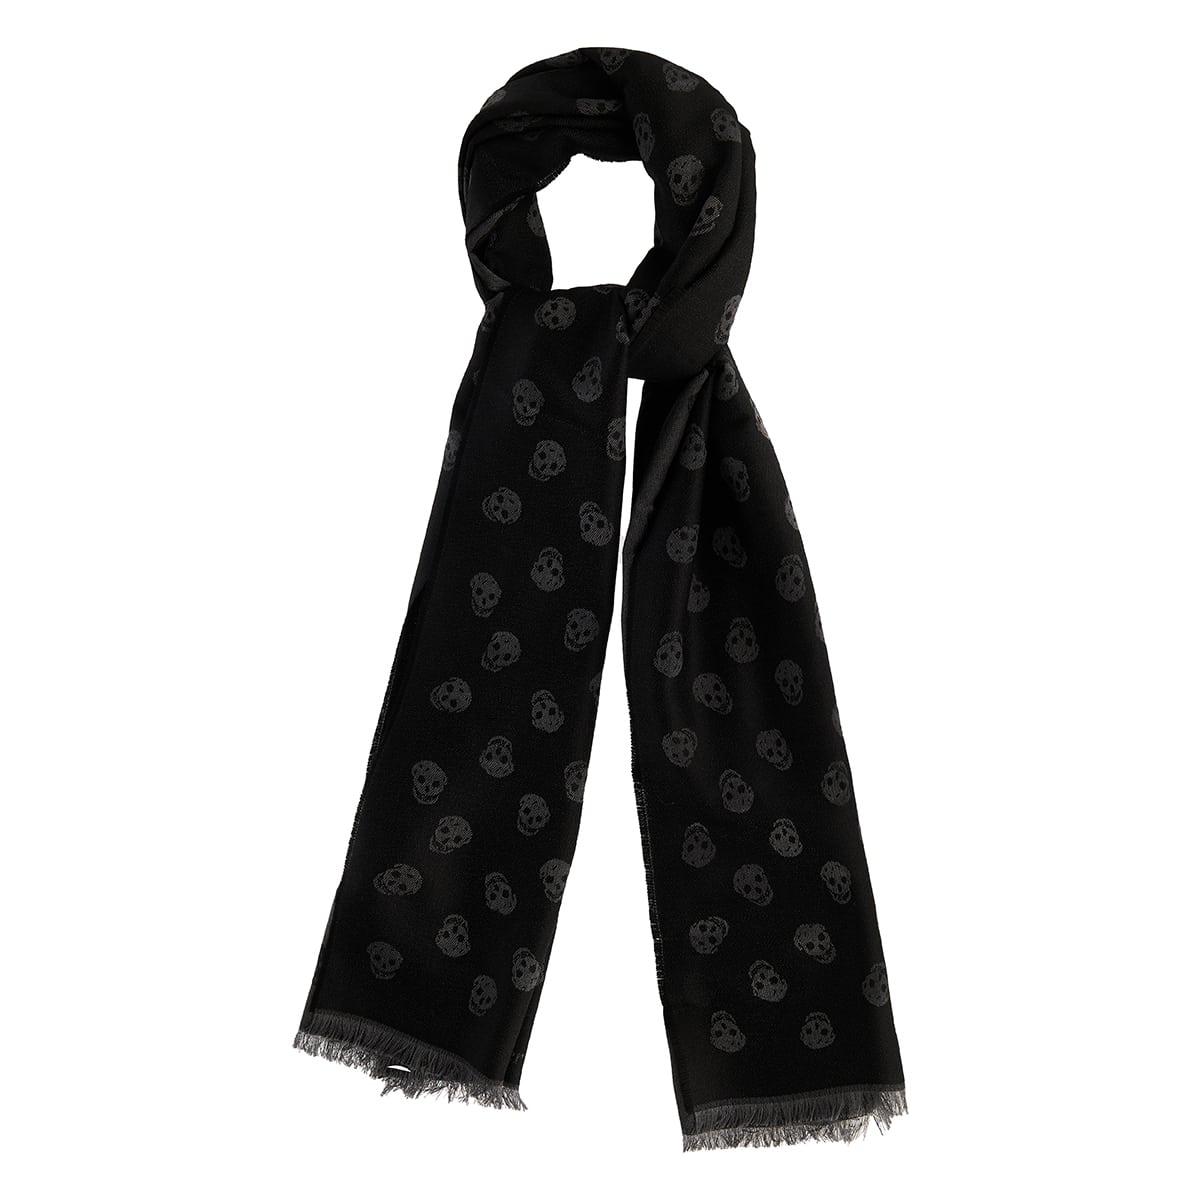 Skull wool scarf